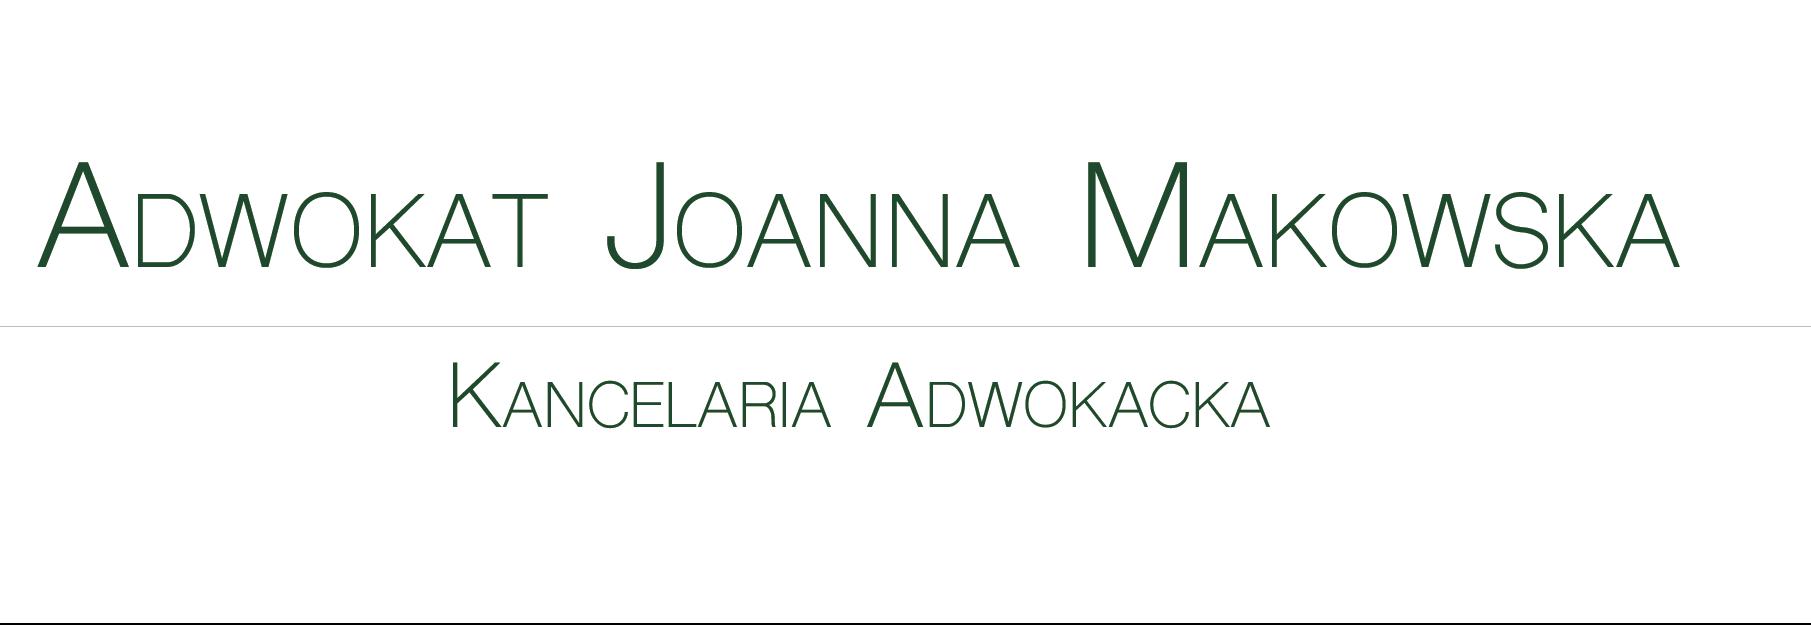 Kancelaria Adwokacka – adwokat Joanna Makowska